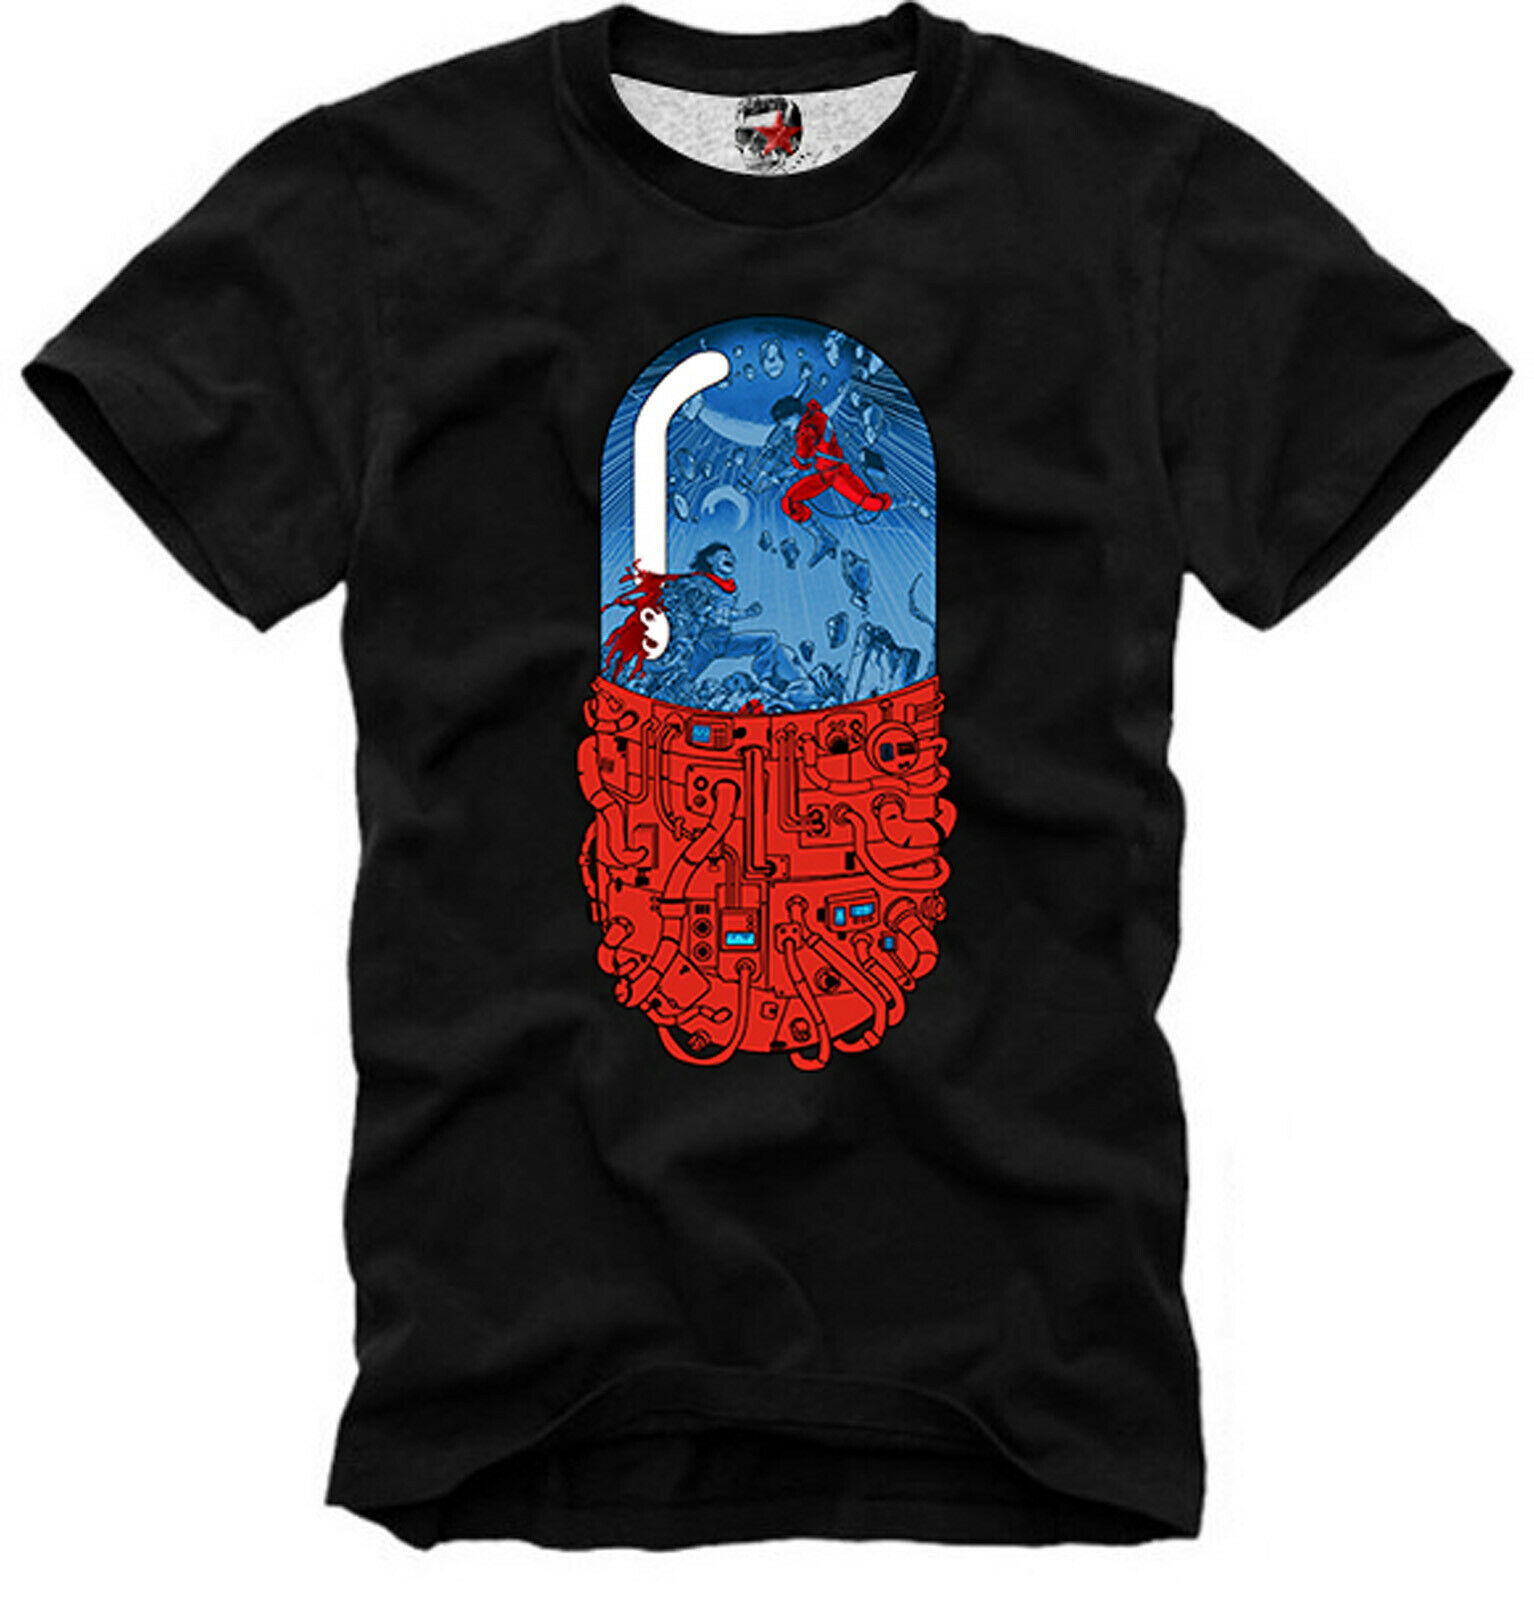 Camiseta Akira Pill rojo azul Matrix Manga Psychonaut psychophape más nueva moda de verano 2019 algodón corto moda para hombres camisetas